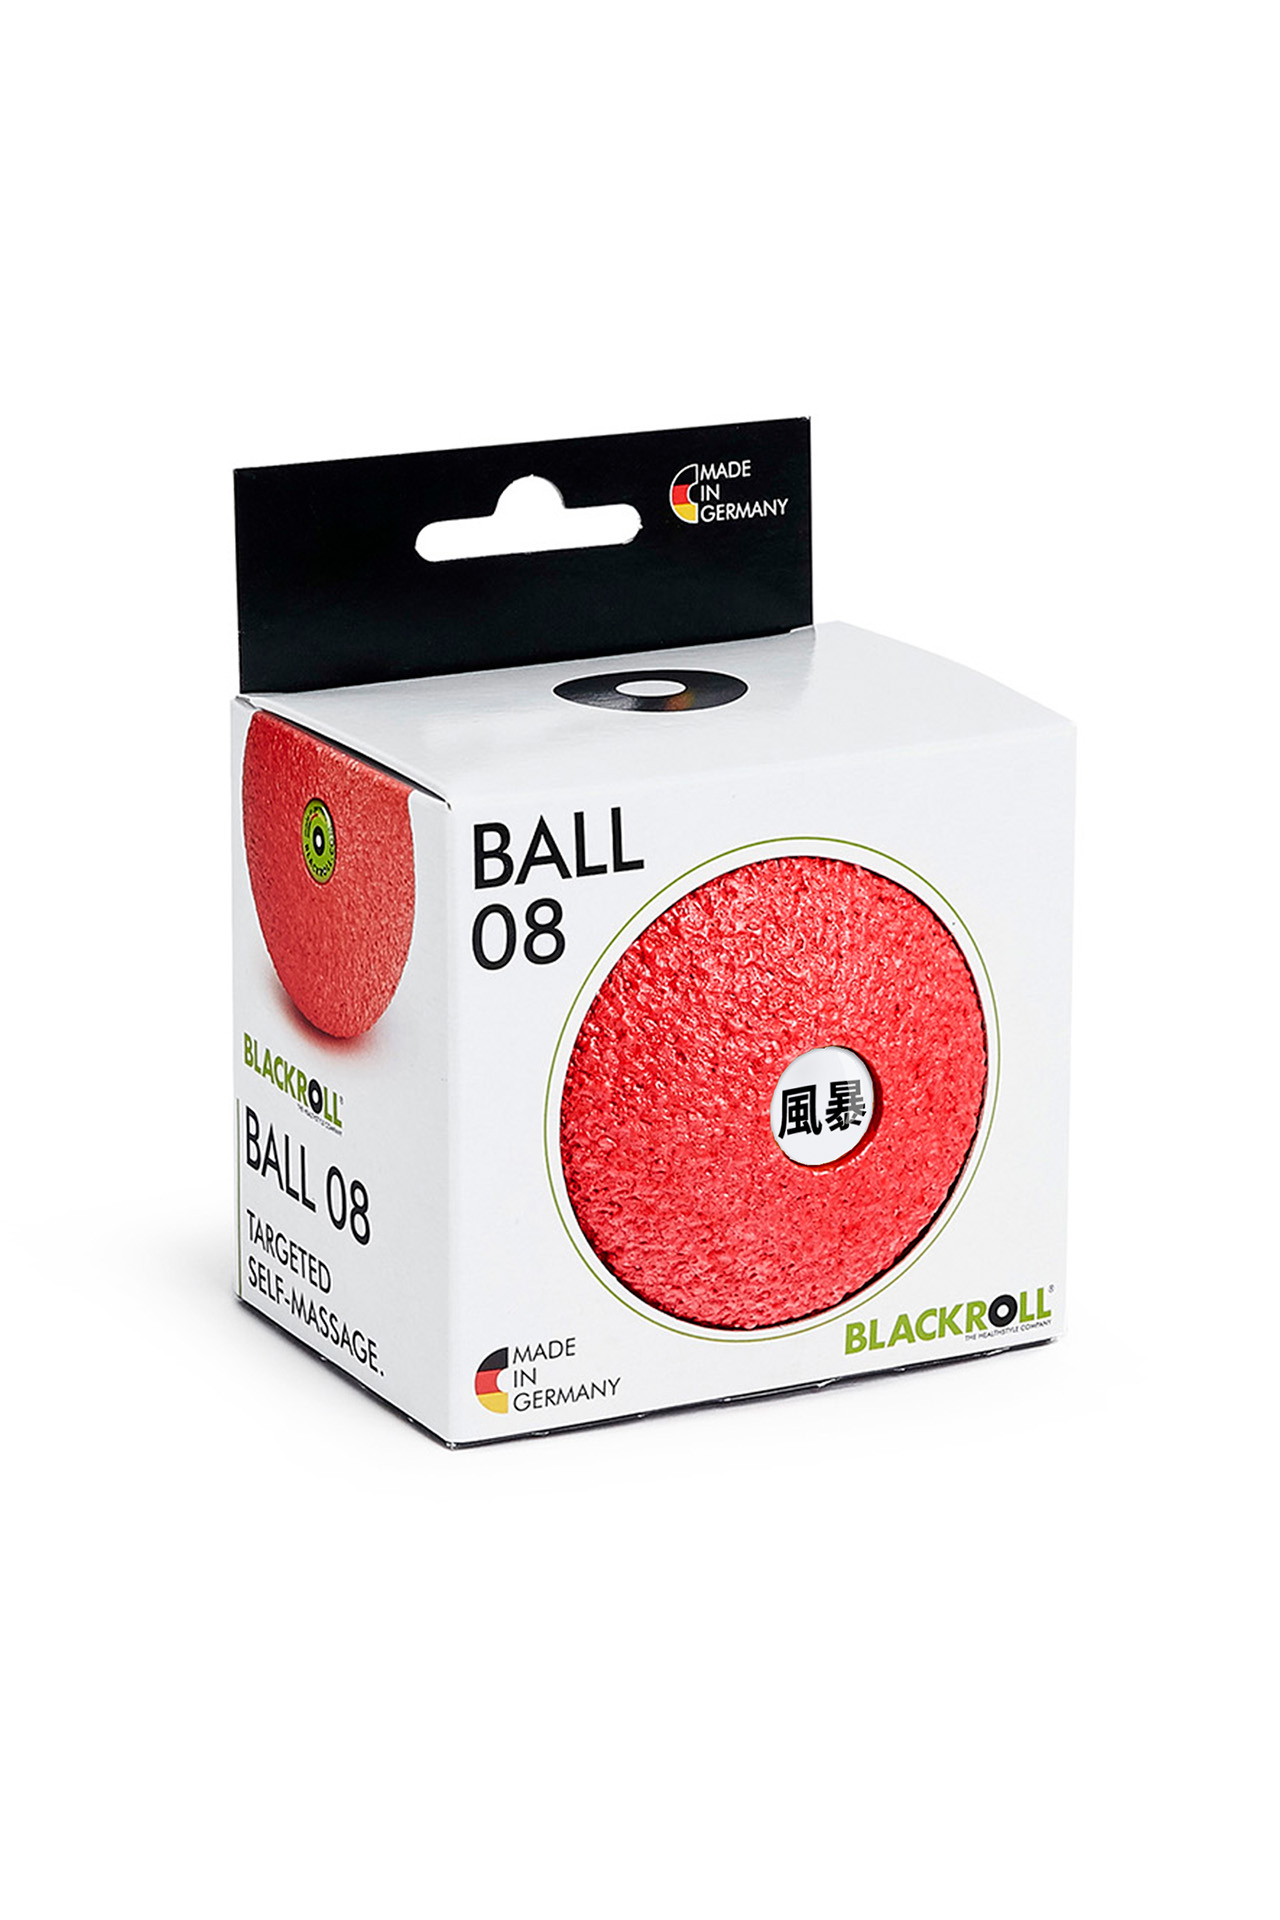 blackroll ball 8cm fengbao kung fu shop wien 1080 verpackung chinesisch rot